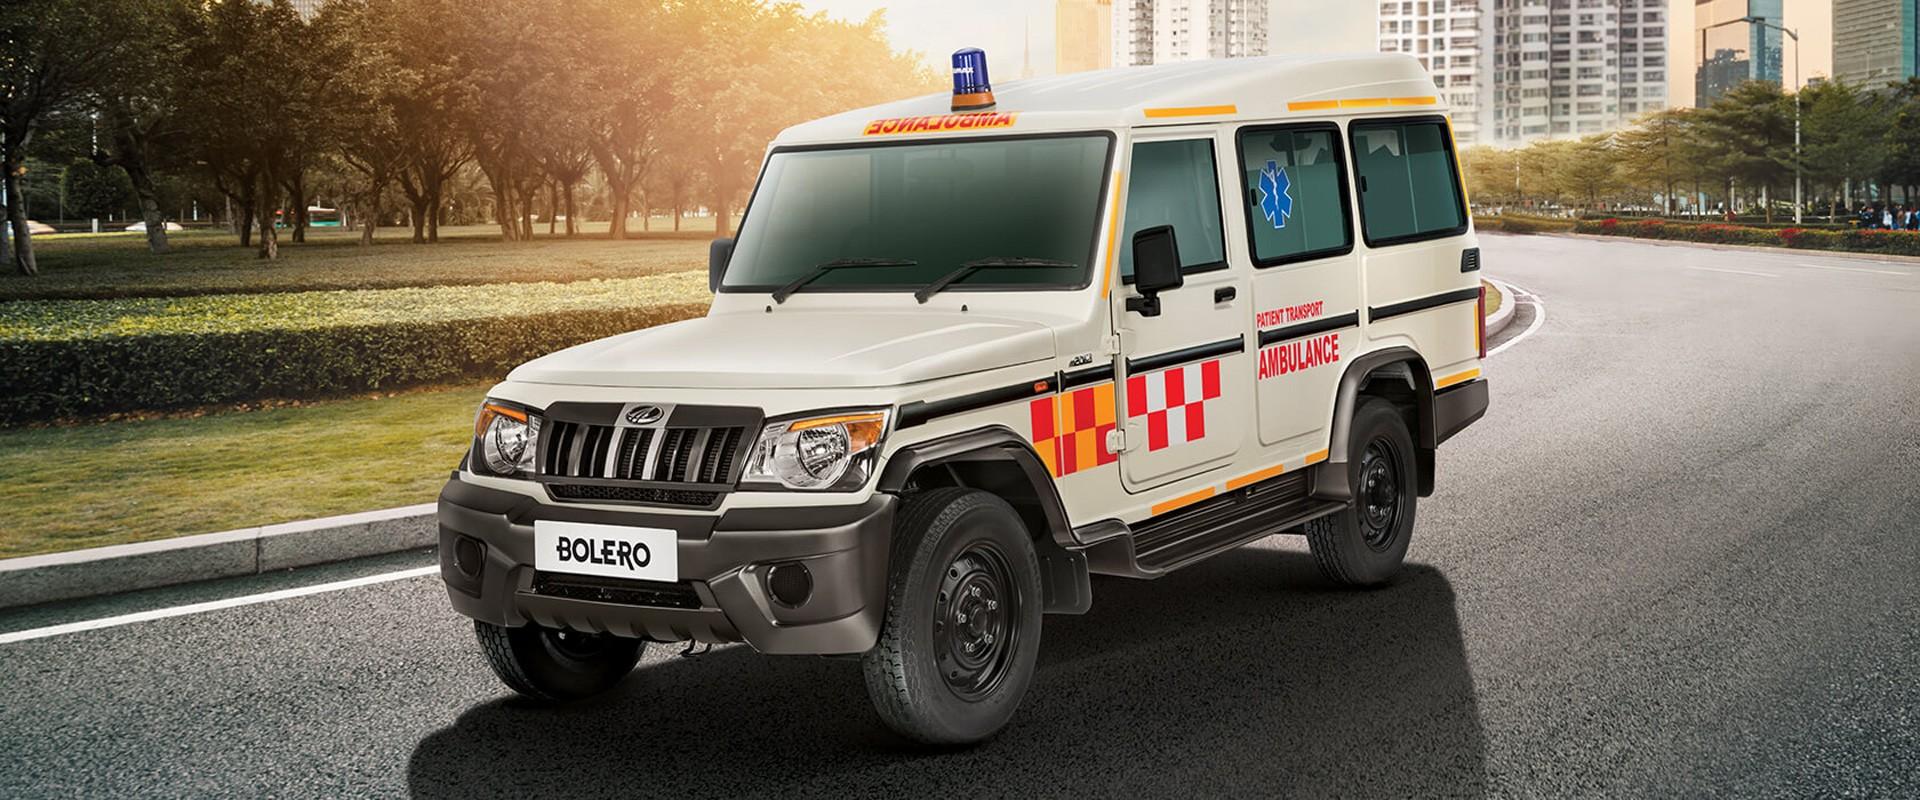 himalayan ambulance home page banner